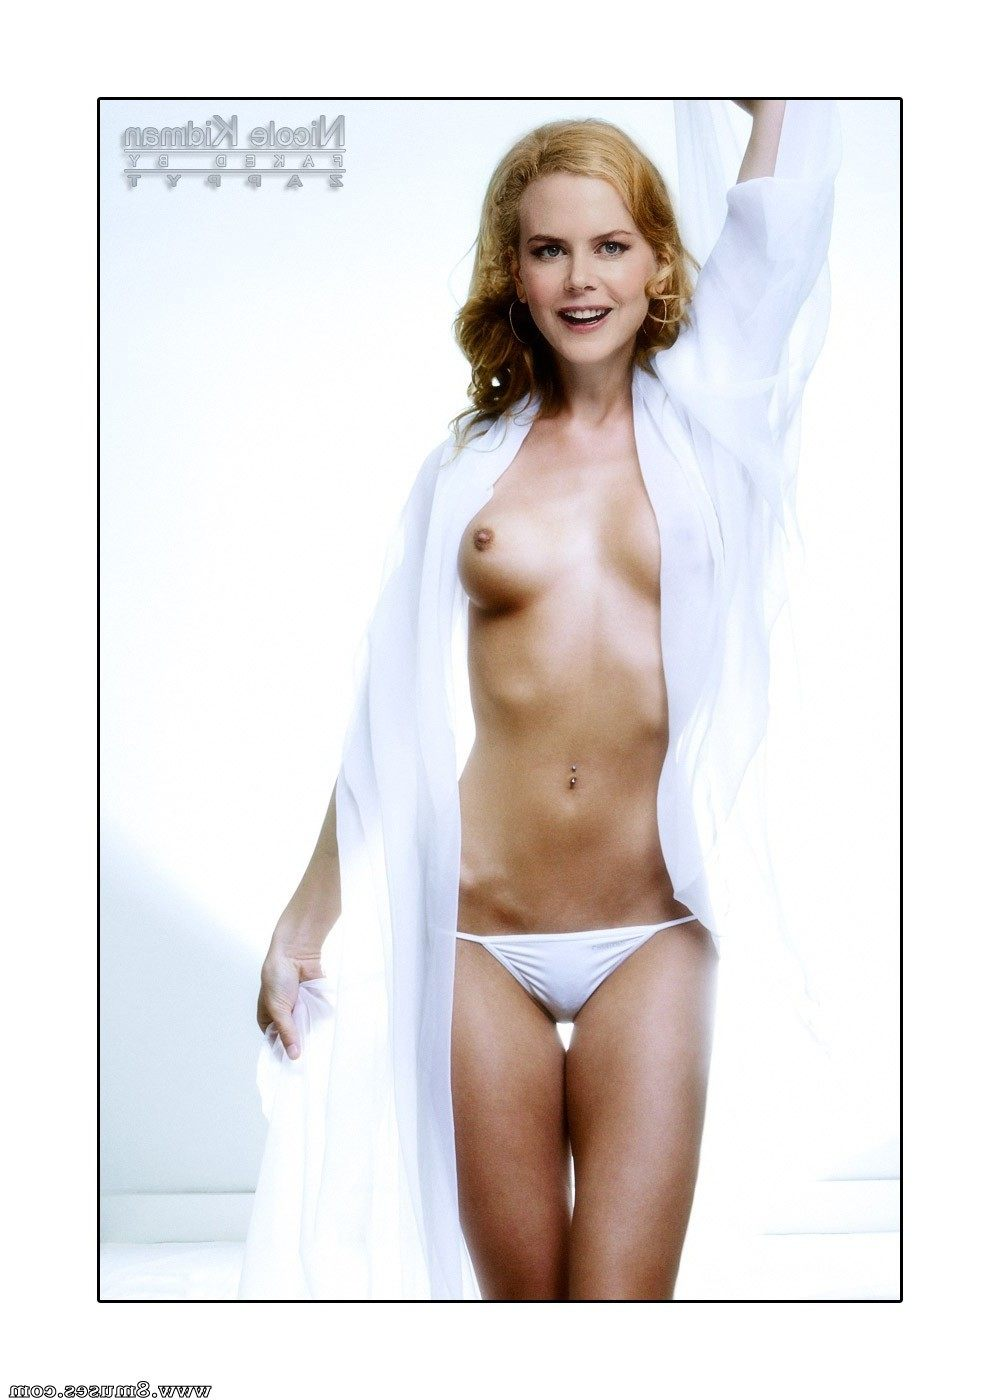 Fake-Celebrities-Sex-Pictures/Nicole-Kidman Nicole_Kidman__8muses_-_Sex_and_Porn_Comics_962.jpg